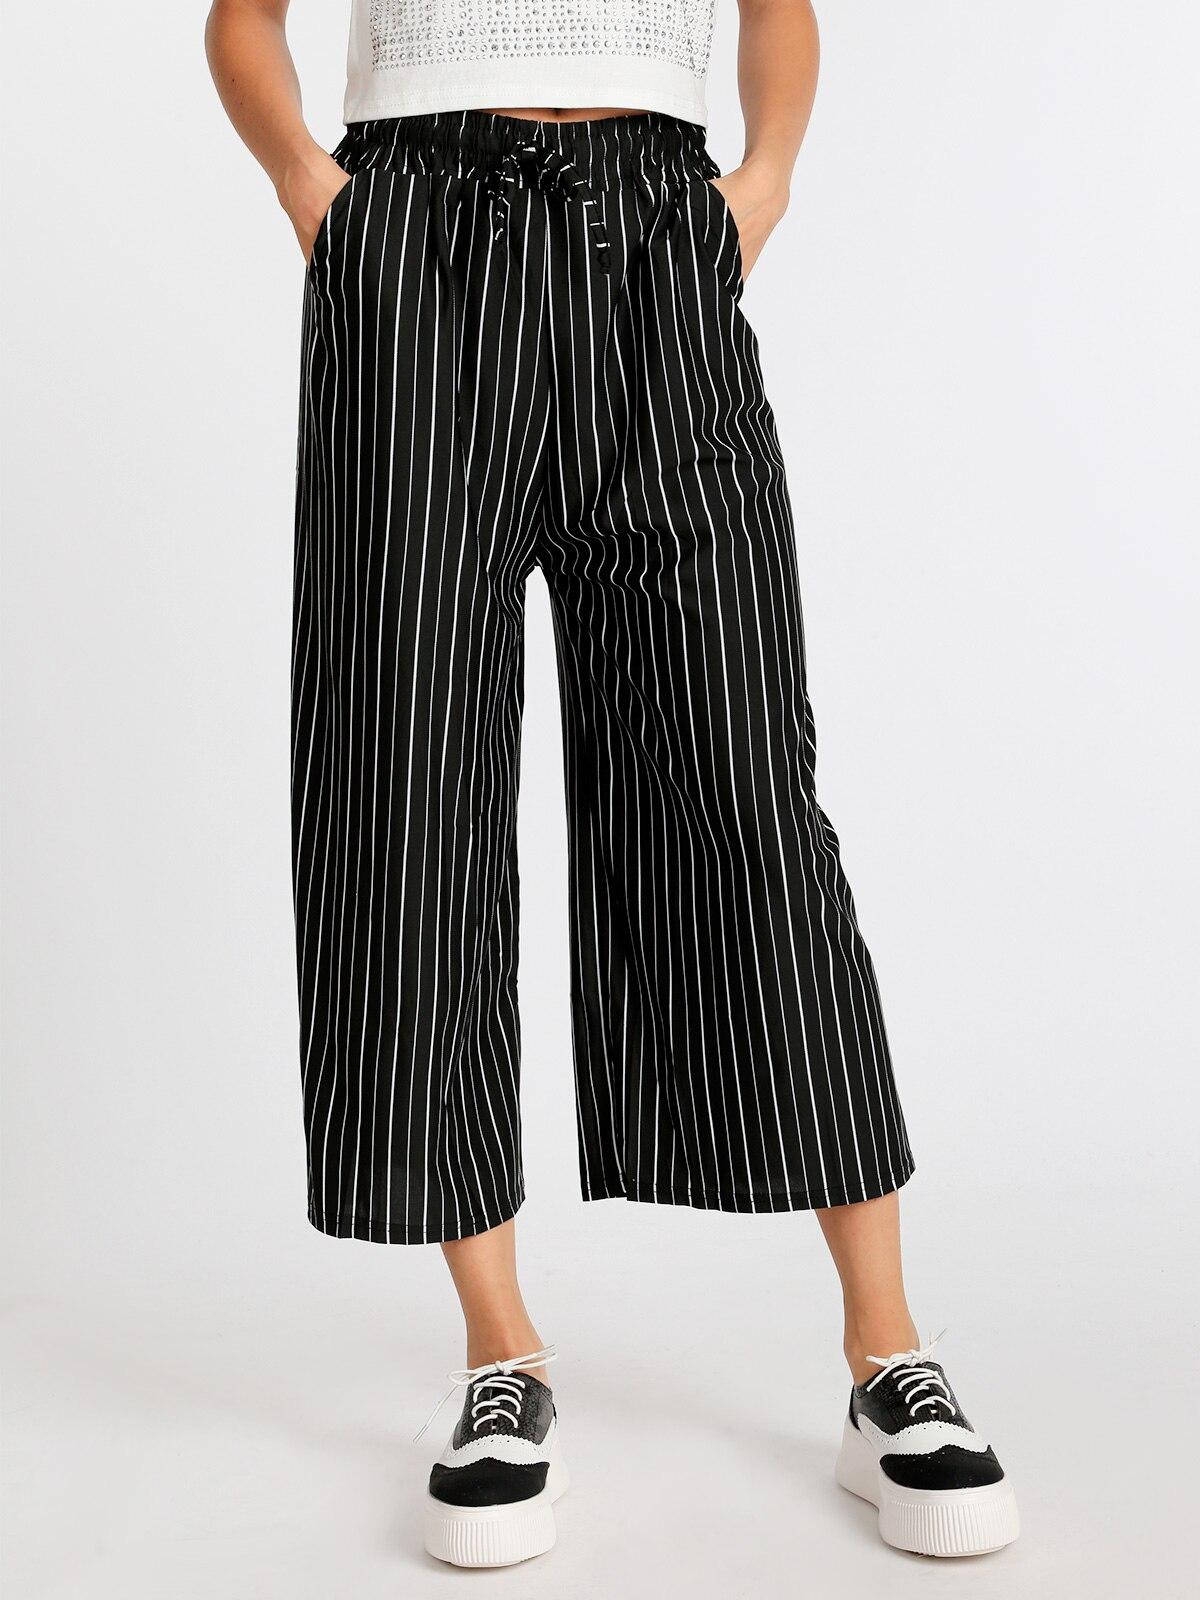 SOLADA Culotte Pants Striped